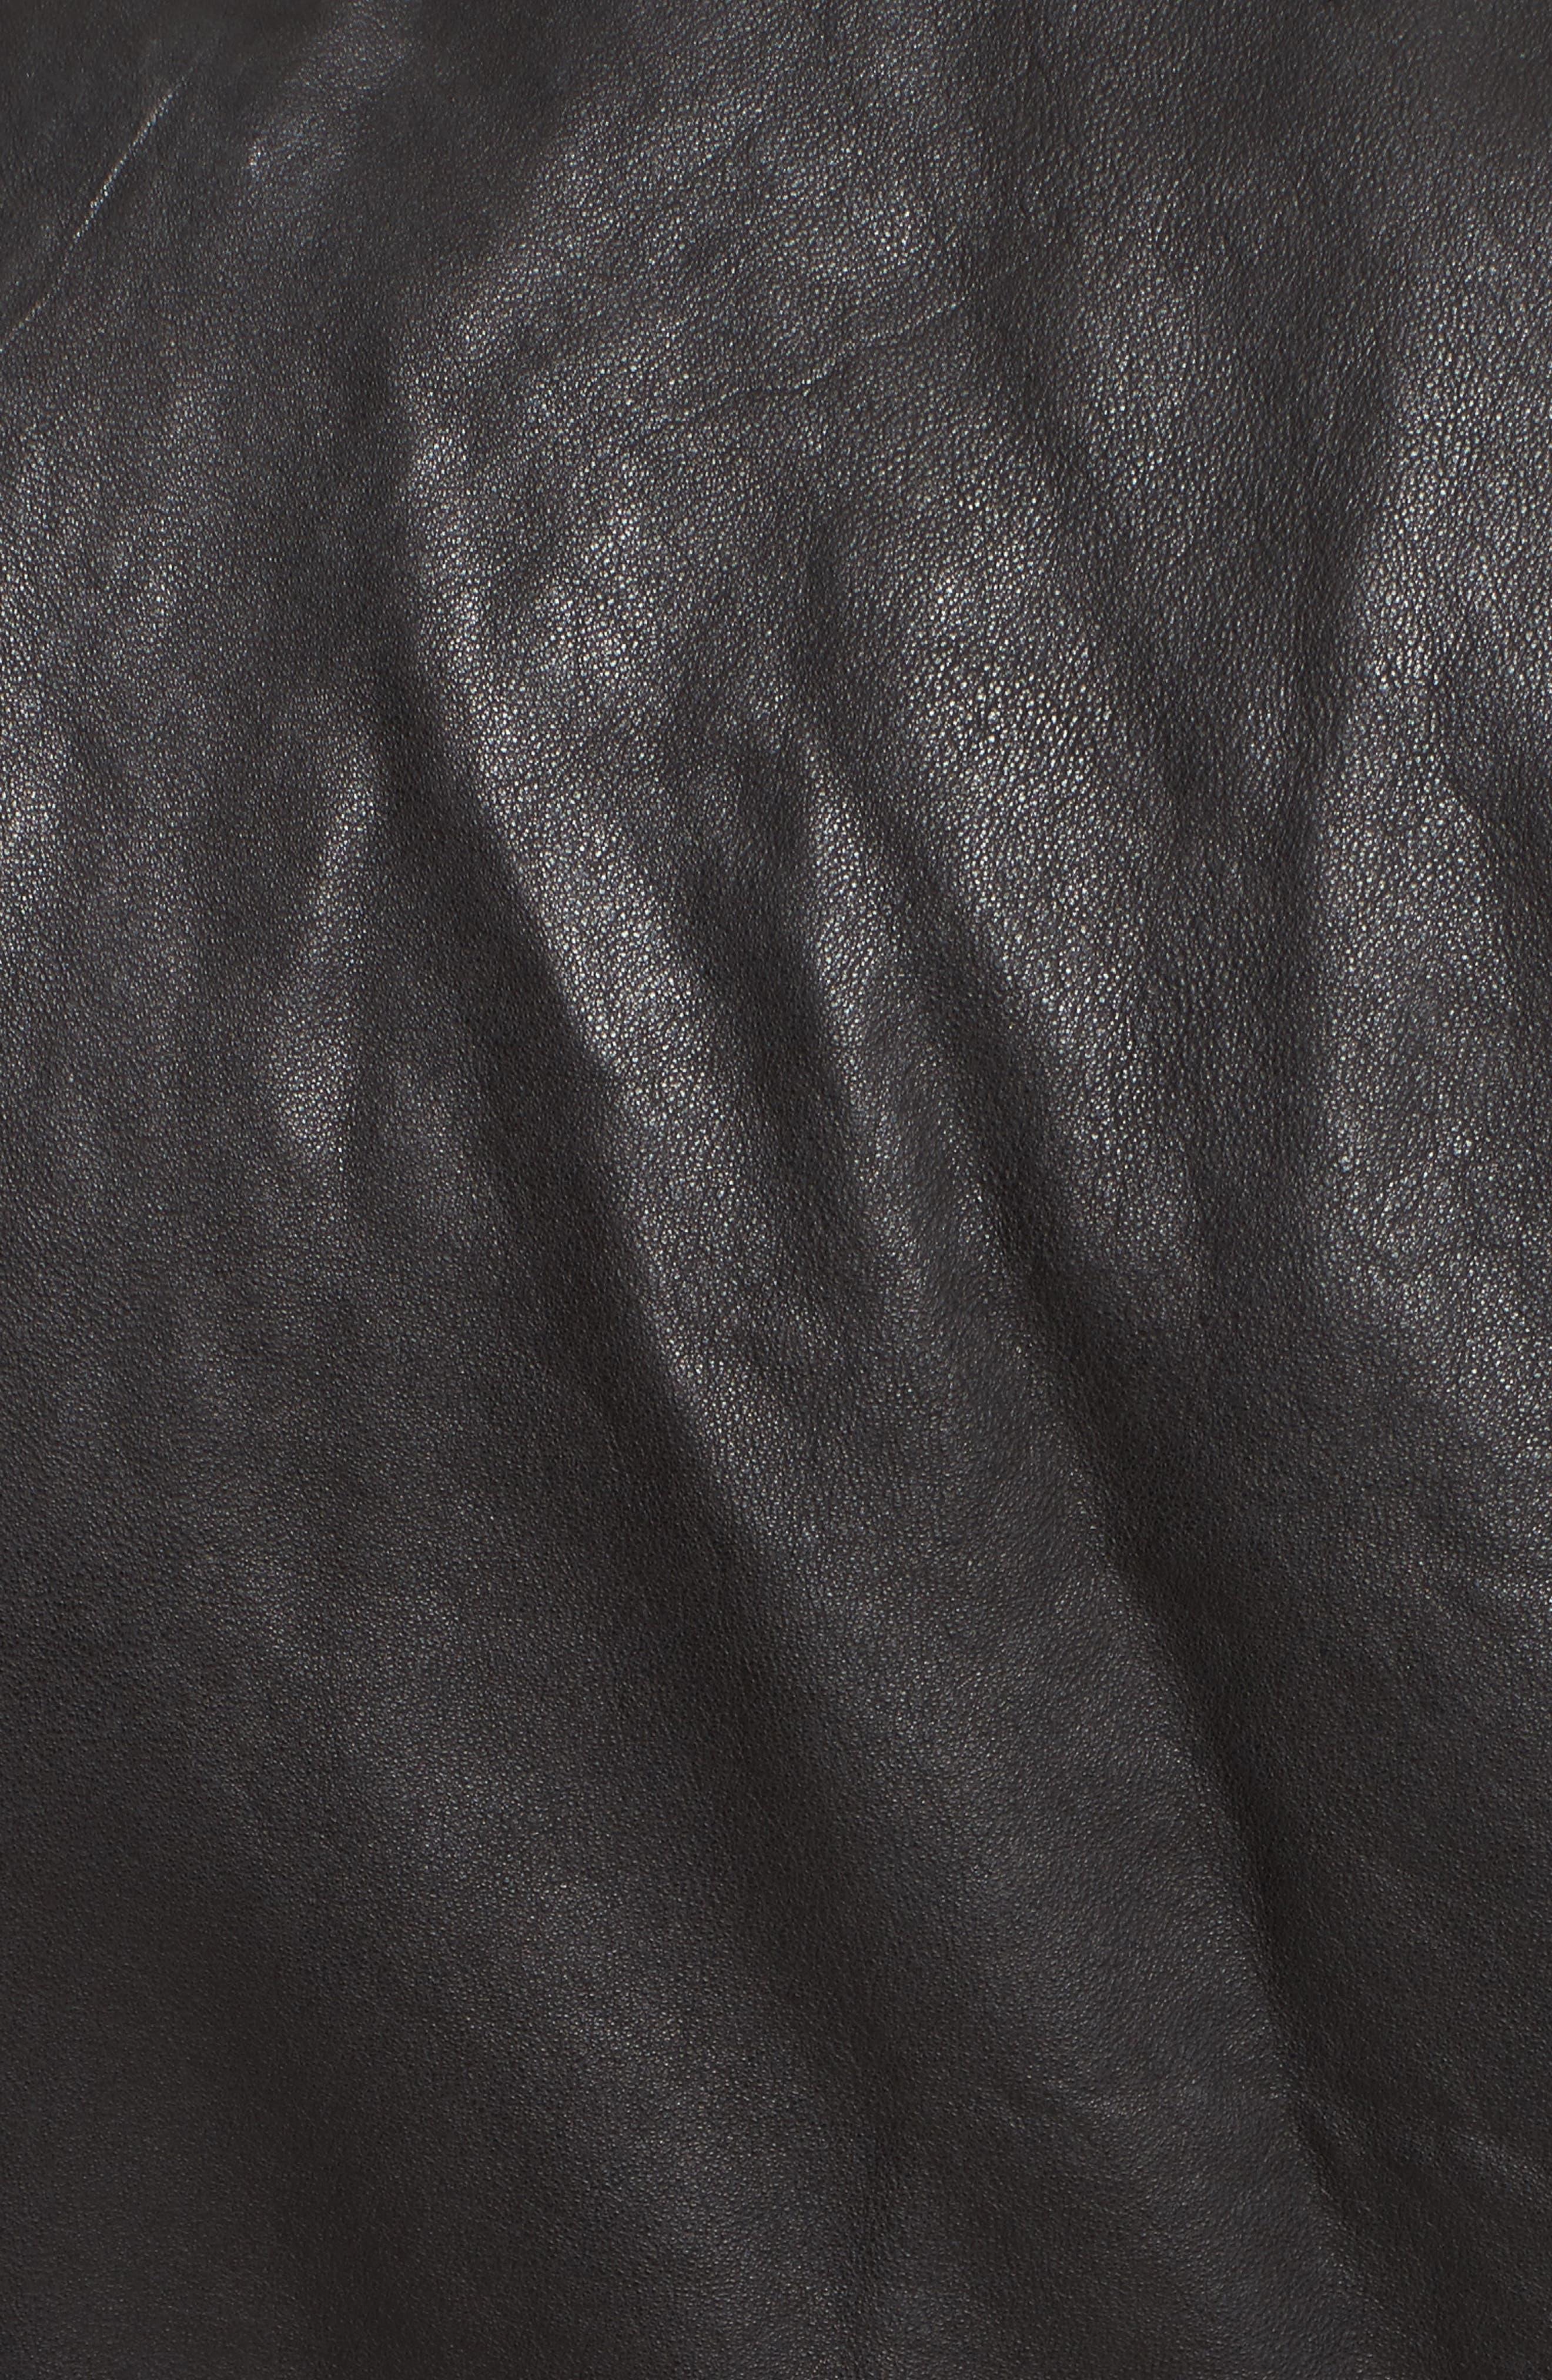 Lyon Leather Jacket,                             Alternate thumbnail 5, color,                             001